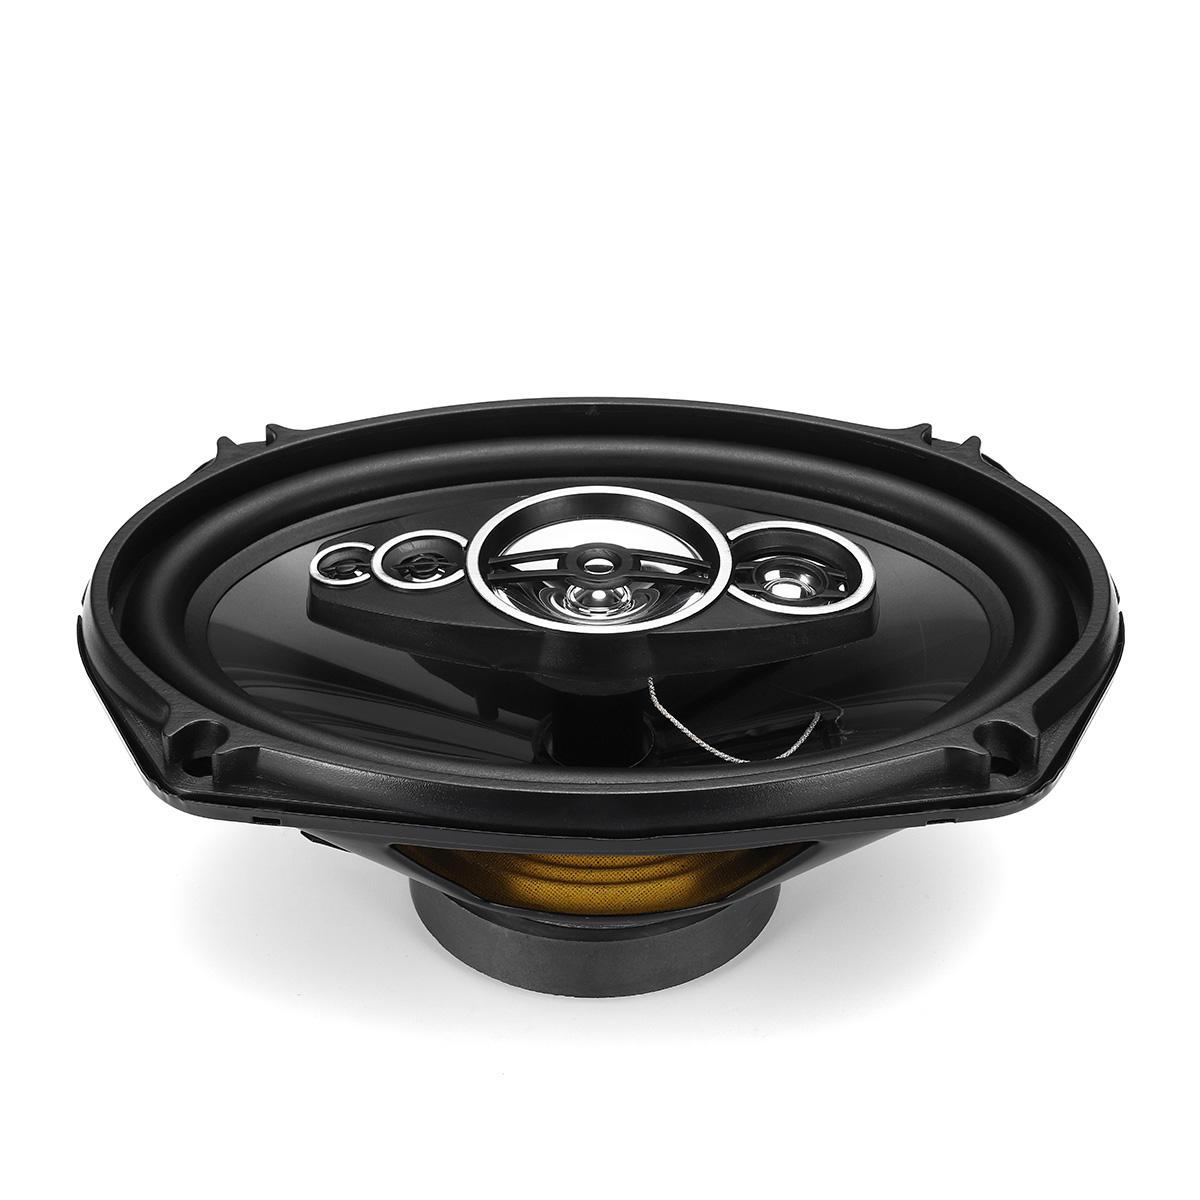 12 Inch 1800W 50 Core High Power Car Woofer Car Speaker - 3